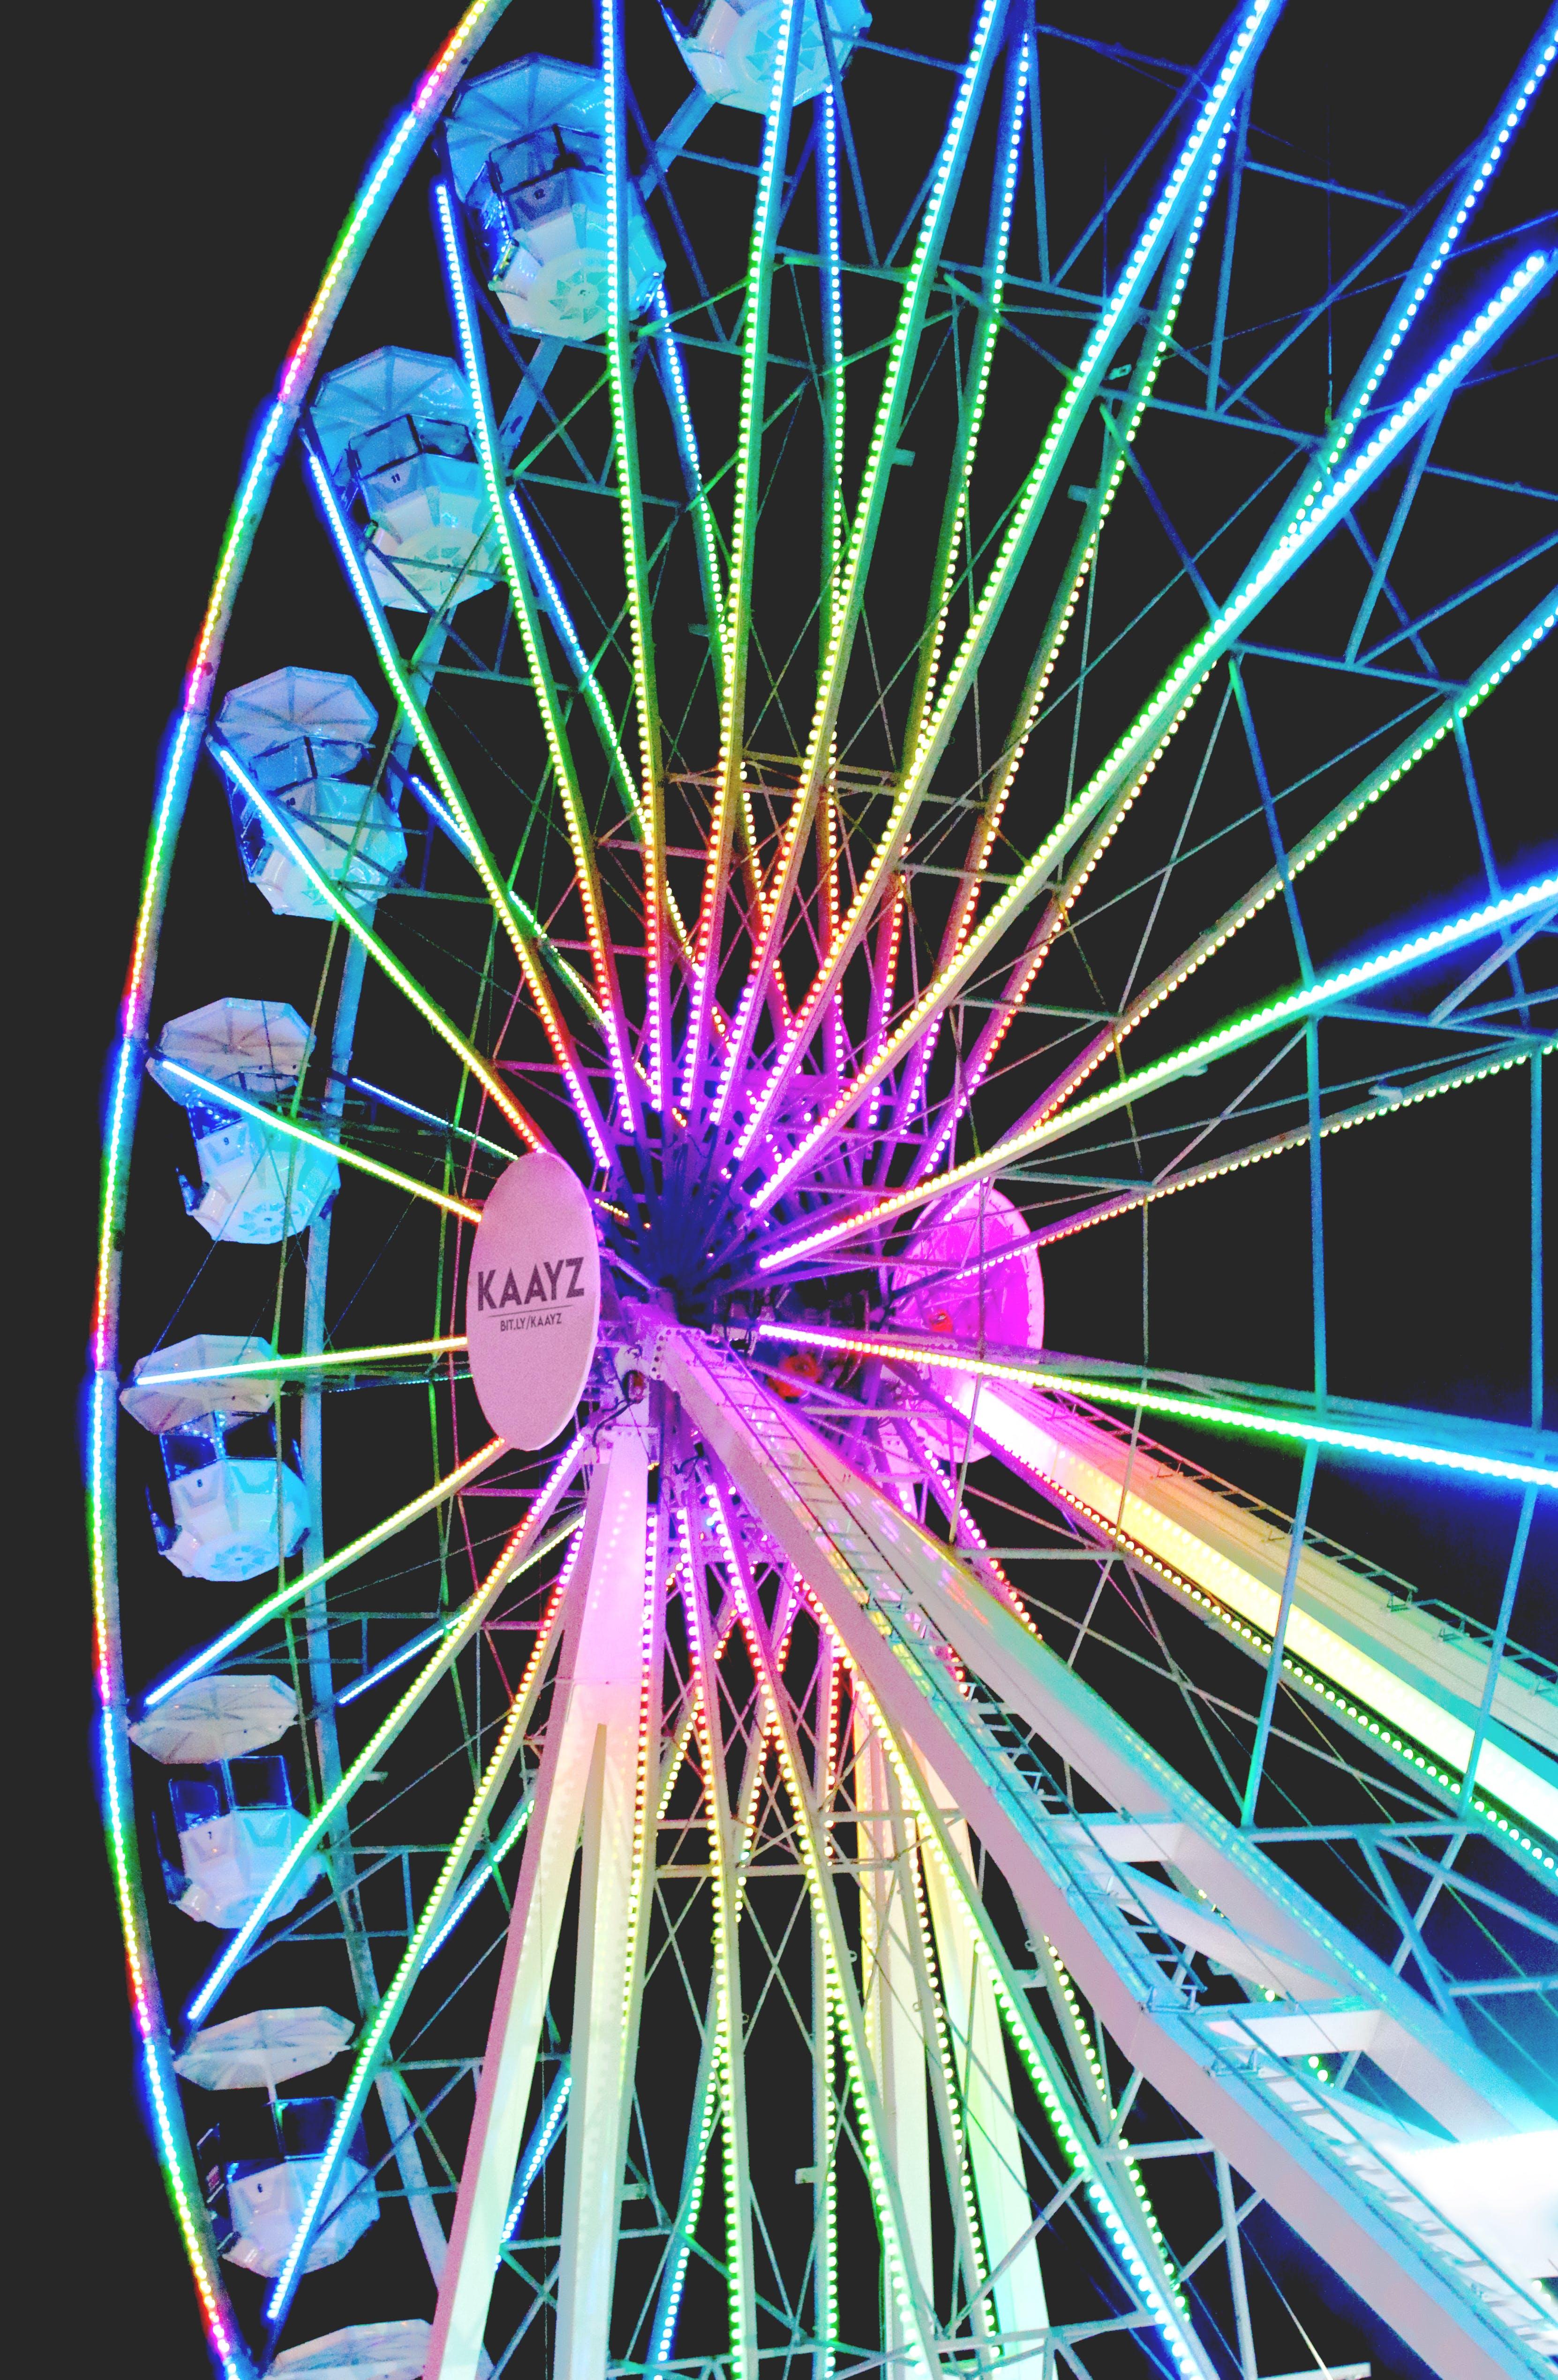 Free stock photo of ferris wheel, night